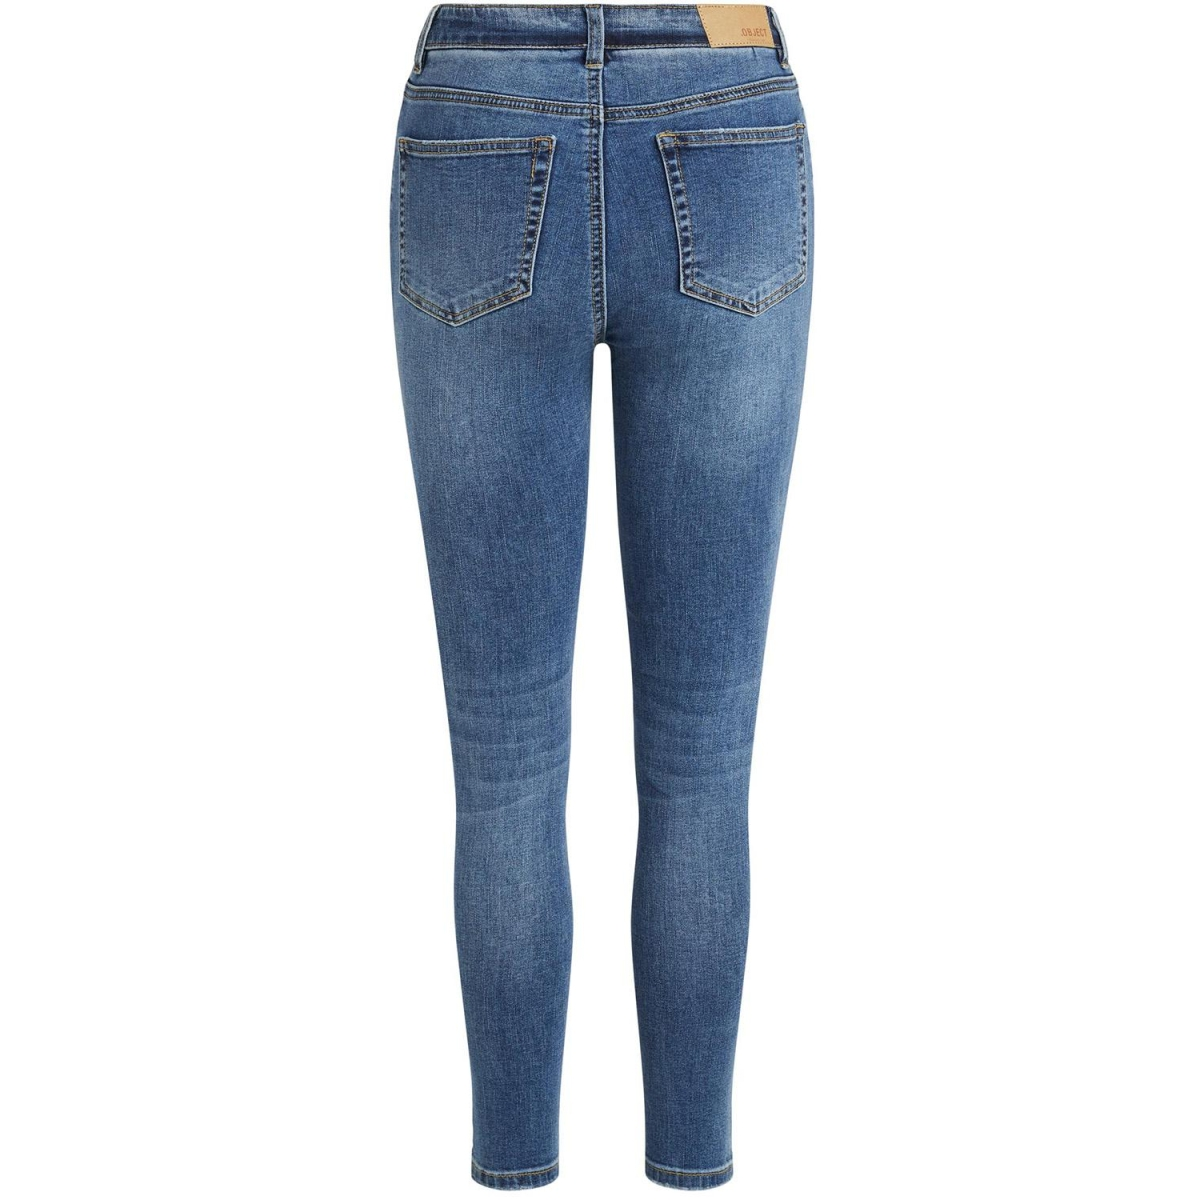 objwin mw skinny jeans pb8 23033133 object jeans medium blue denim